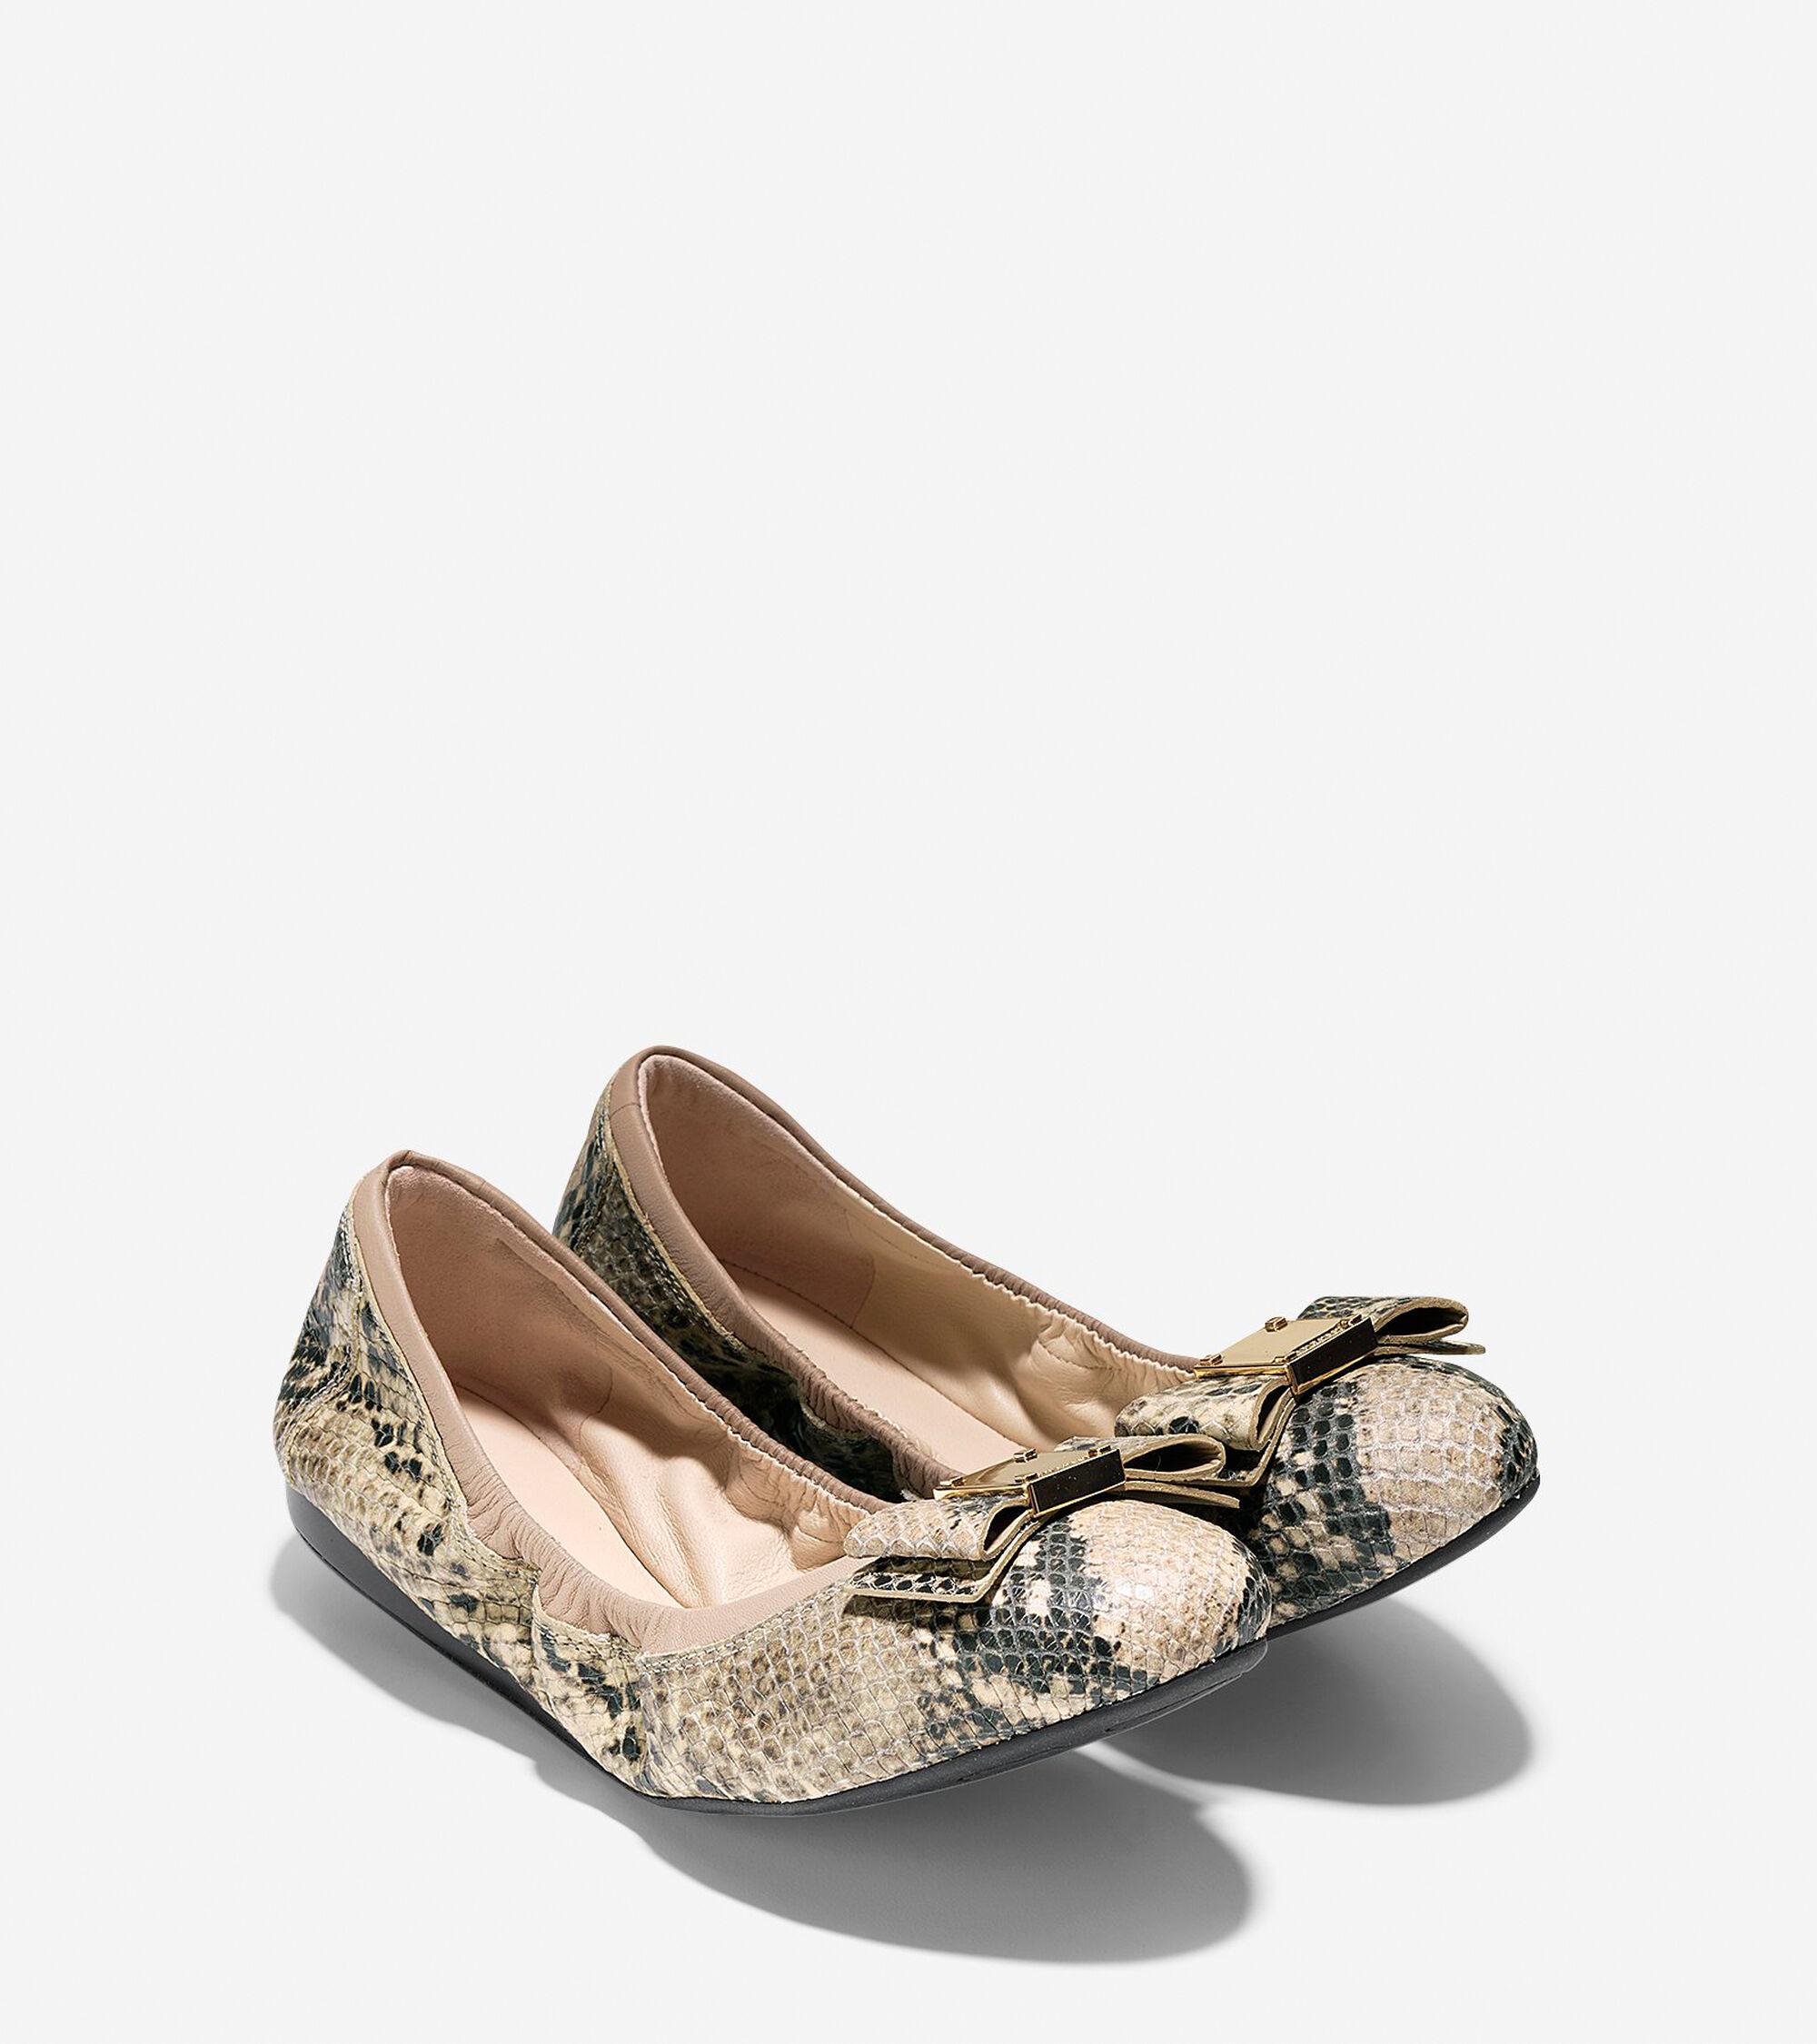 95231ccfbb53 Women s Tali Bow Ballet Flats in Roccia Snake Print